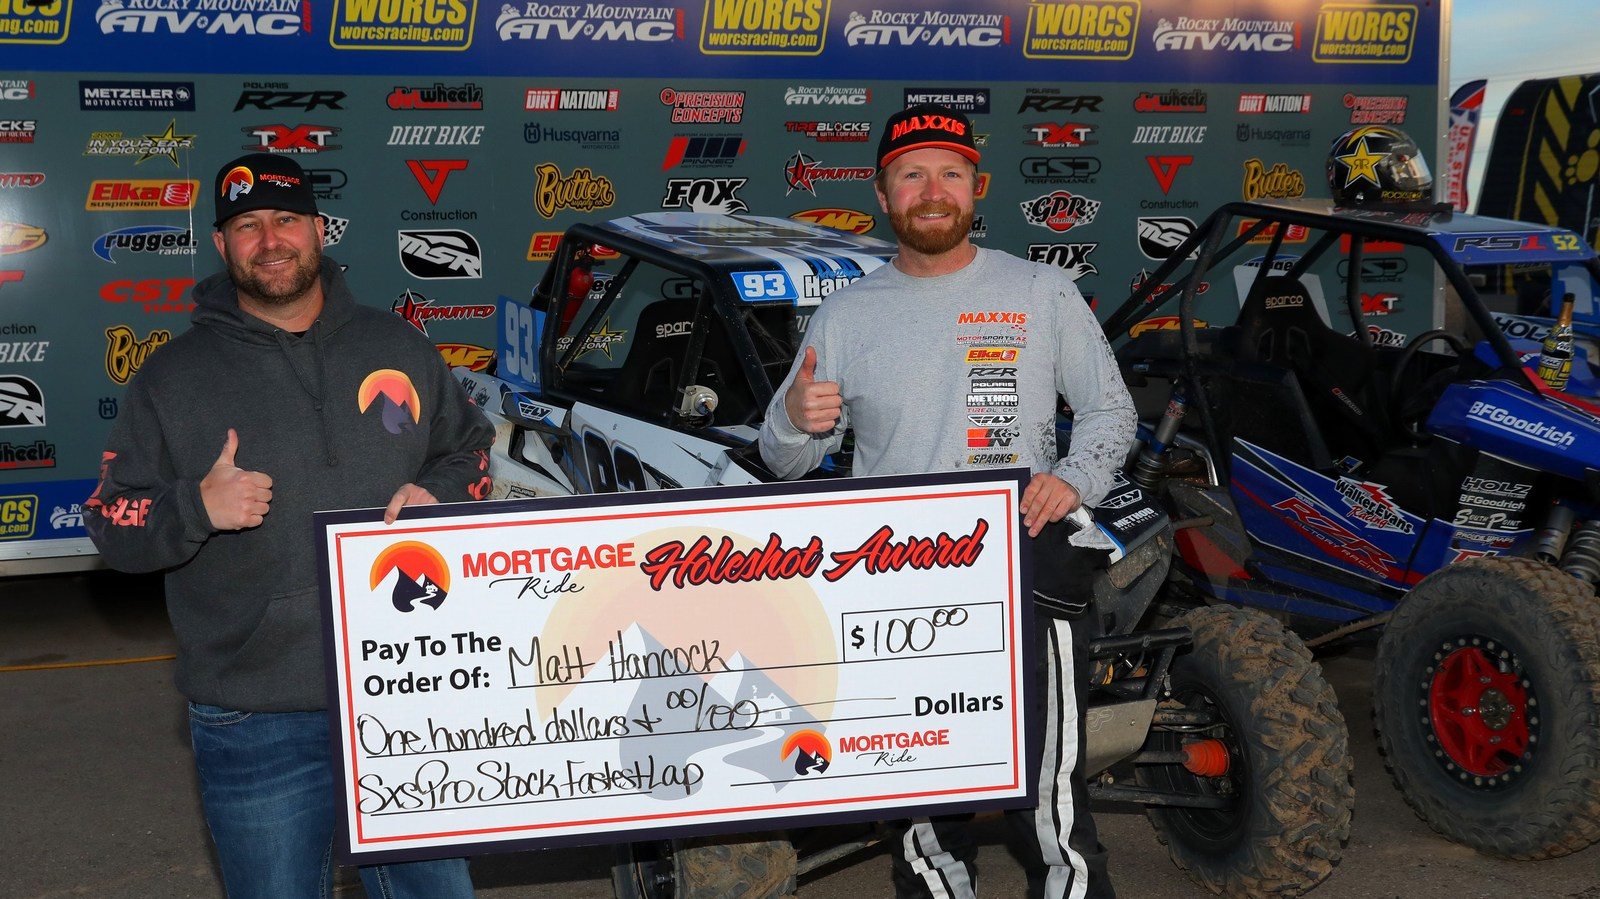 2019-01-matt-hancock-holeshot-award-sxs-worcs-racing